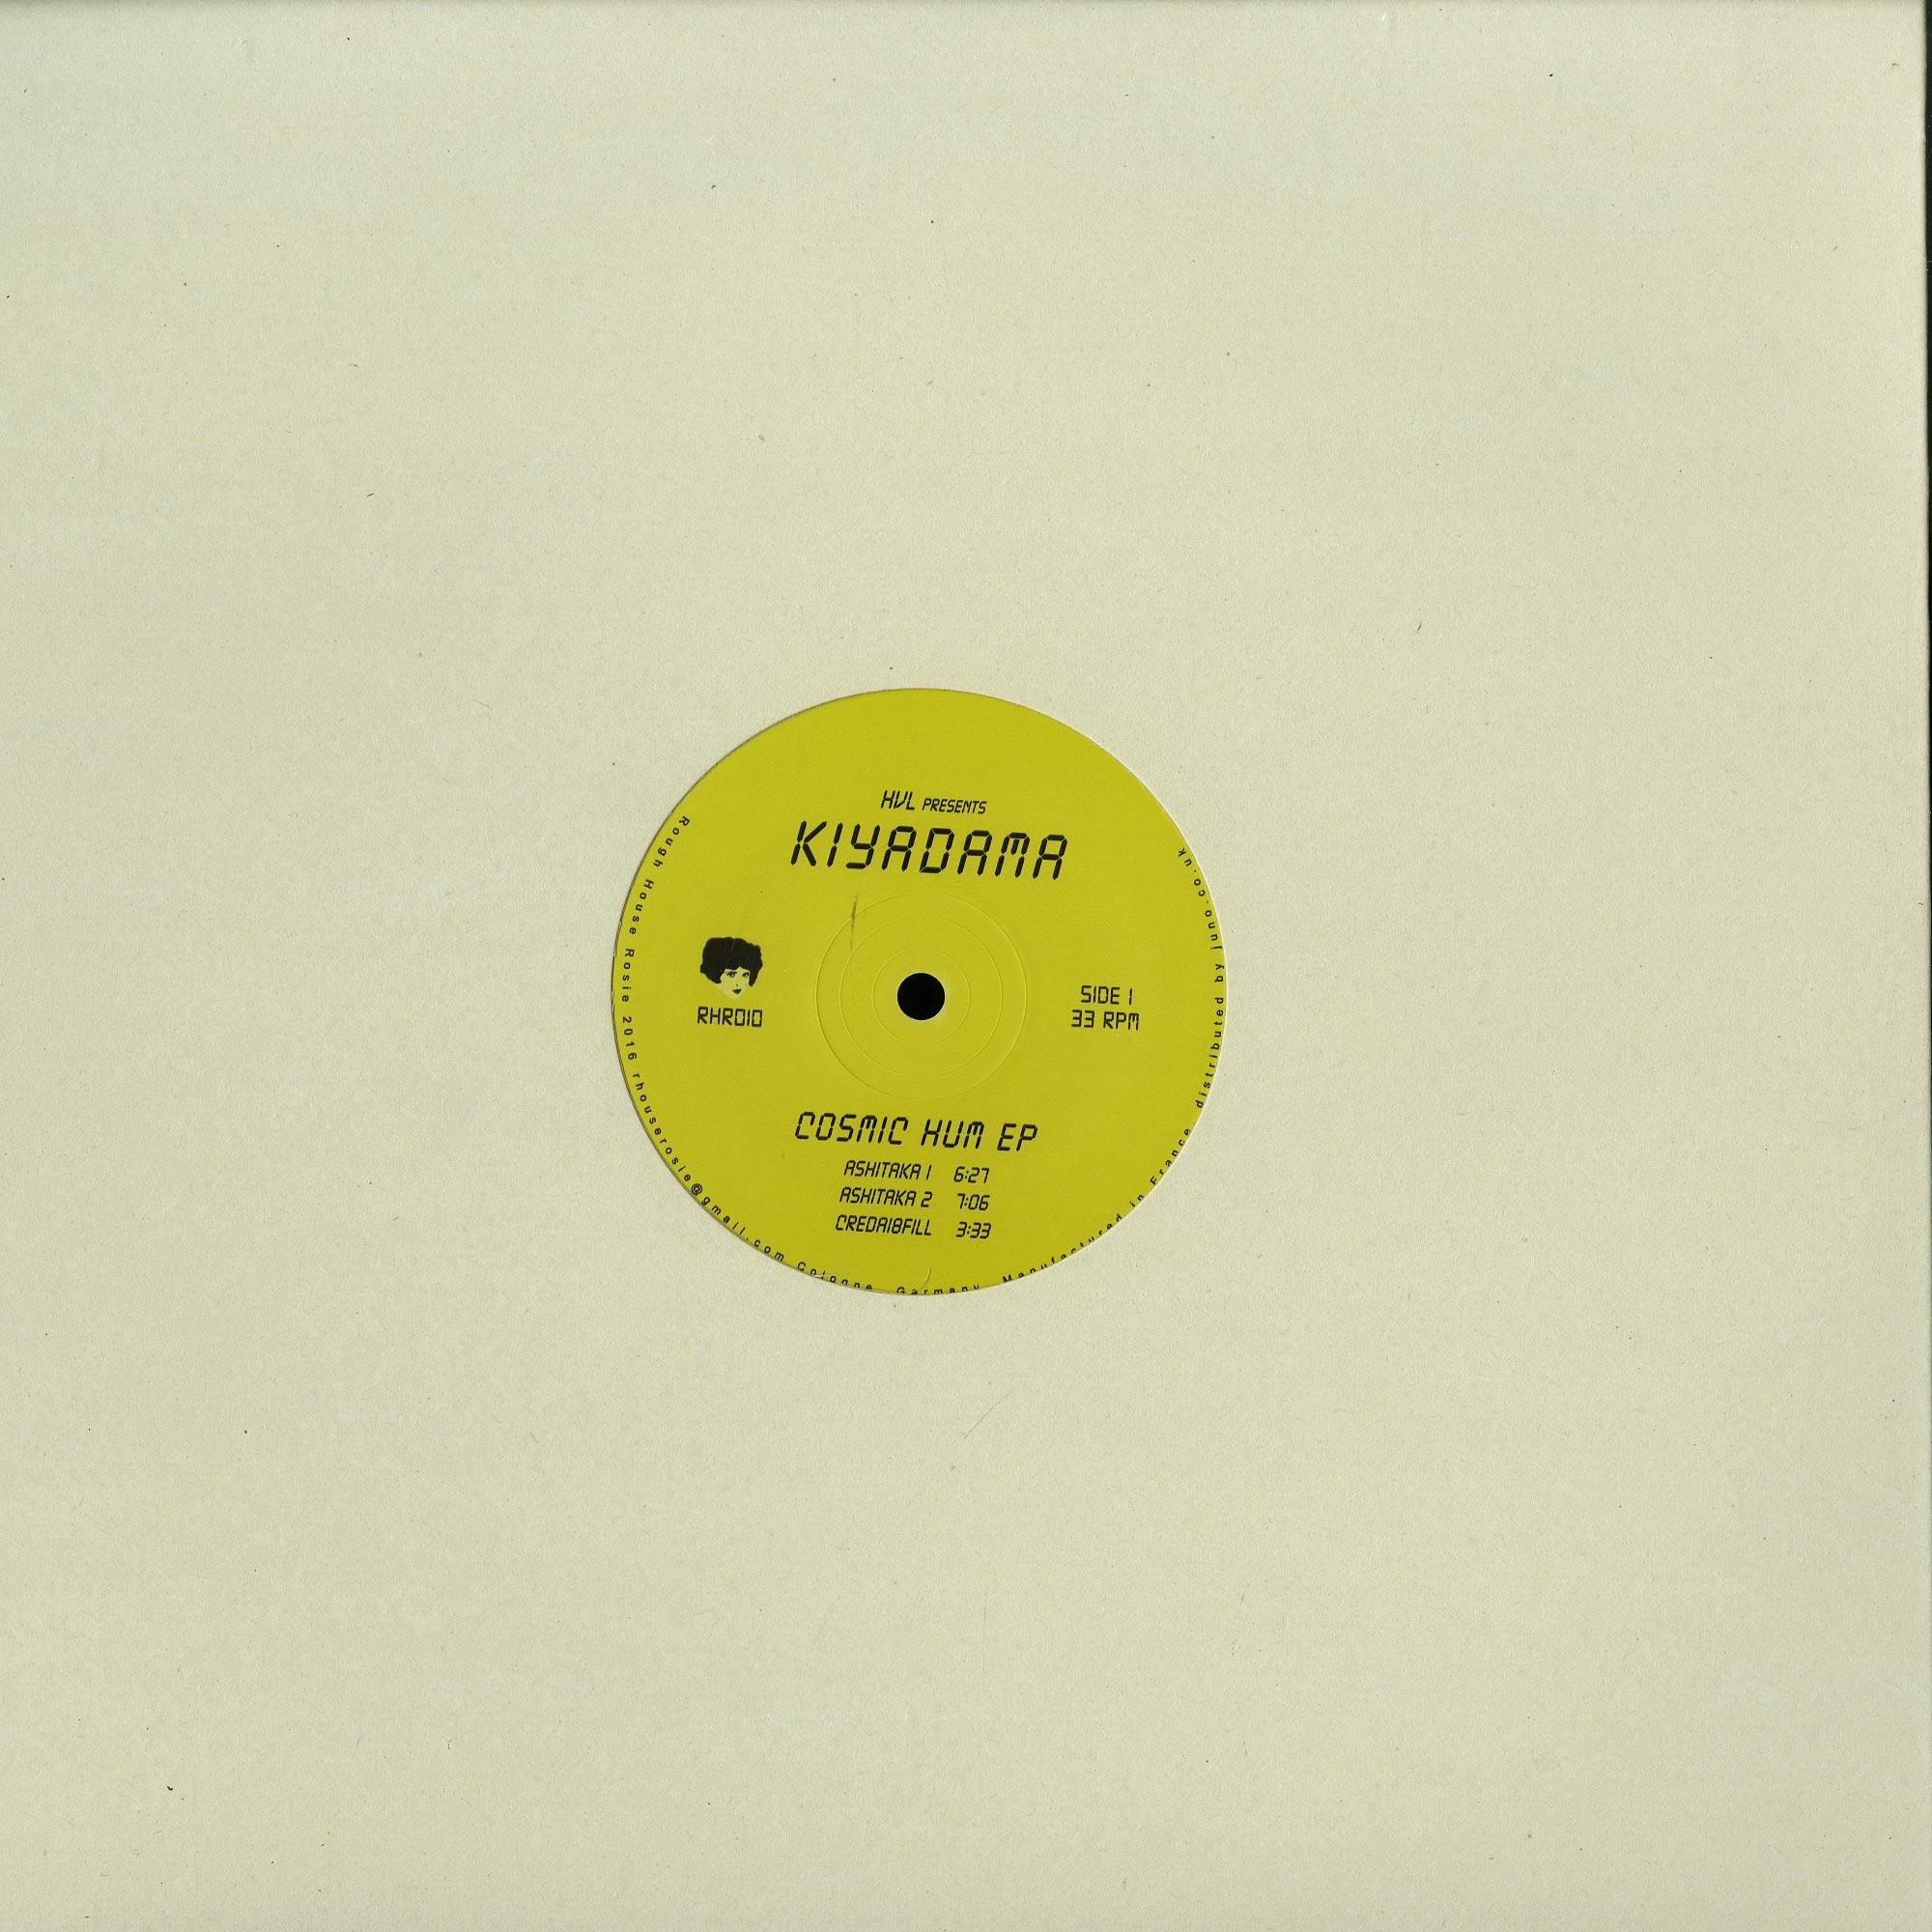 HVL presents KIYADAMA - COSMIC HUM EP